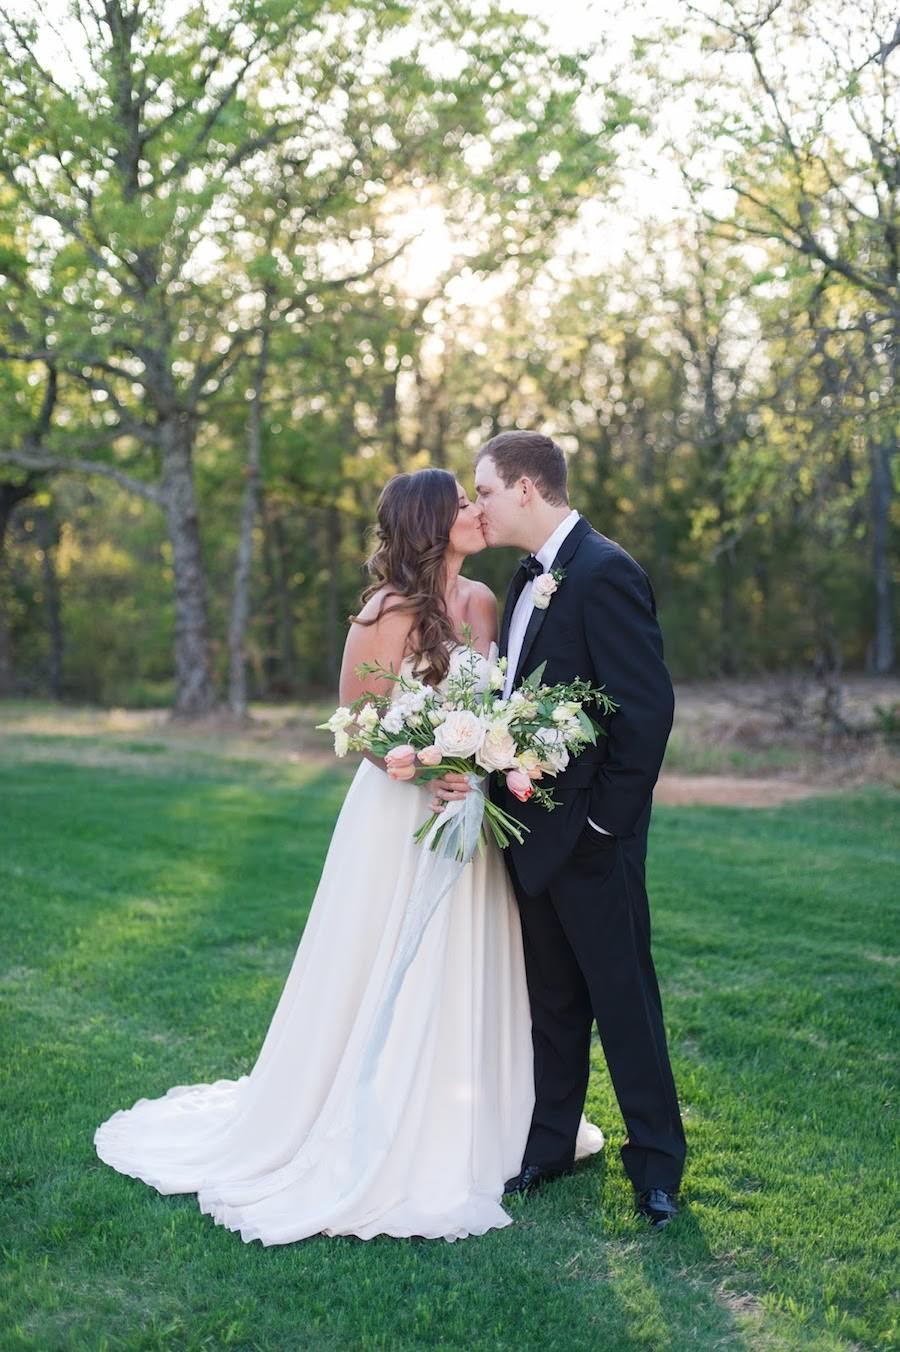 Texas White Barn Wedding Inspiration, White Sparrow Barn, Dallas Wedding Planner, Texas Wedding Planner, Dallas Wedding Designer, Luxury Wedding Planner, Texas Wedding Designer, Featured on The Southeastern Bride